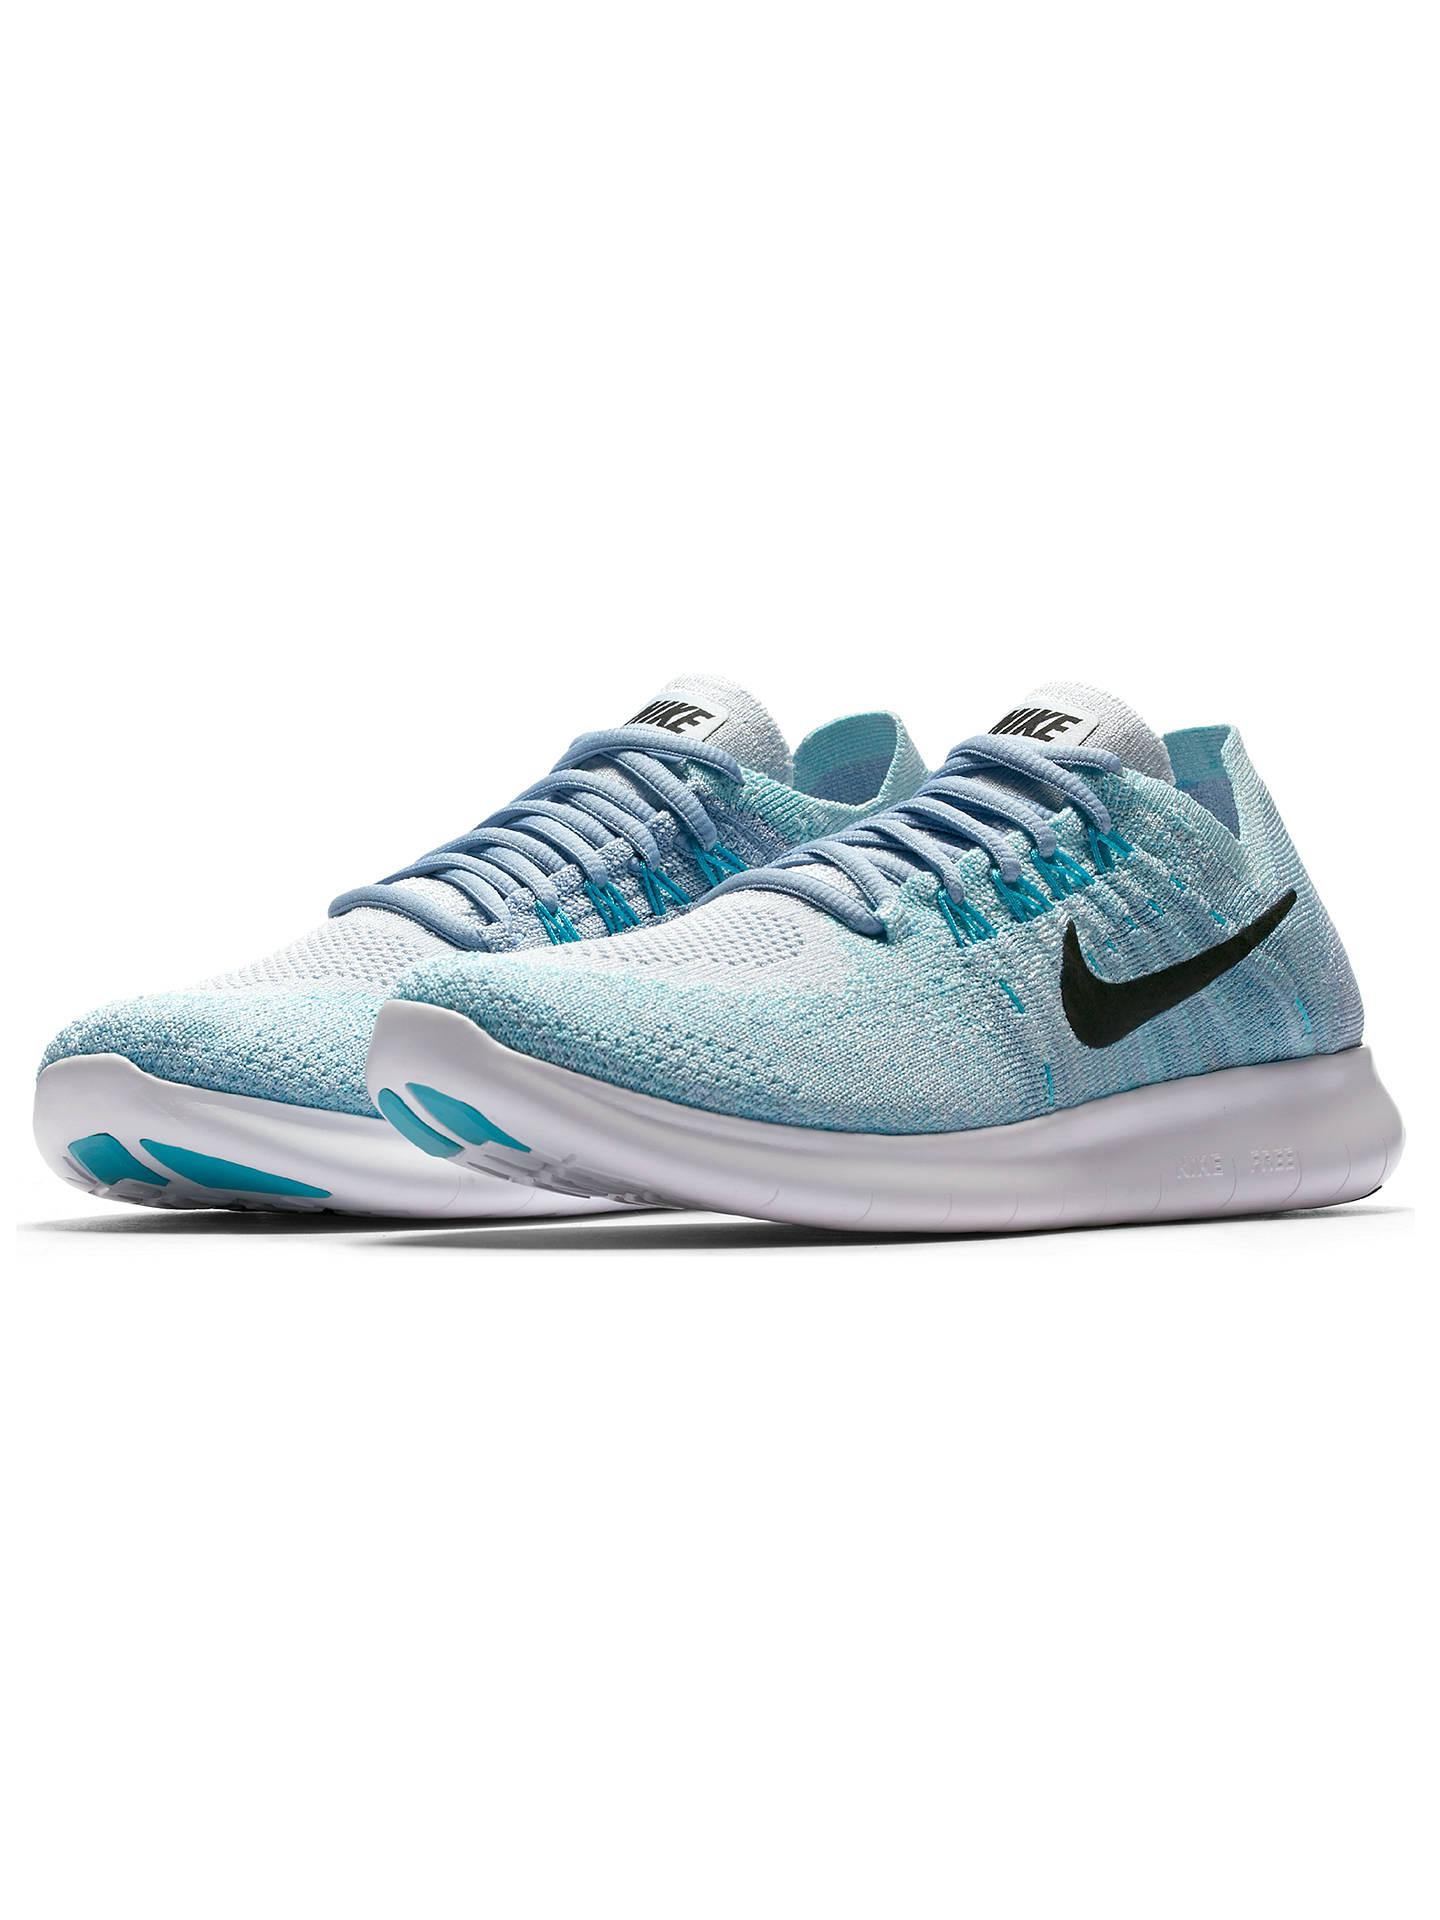 Nike Free Rn Flyknit 2017 Women S Running Shoes At John Lewis Partners